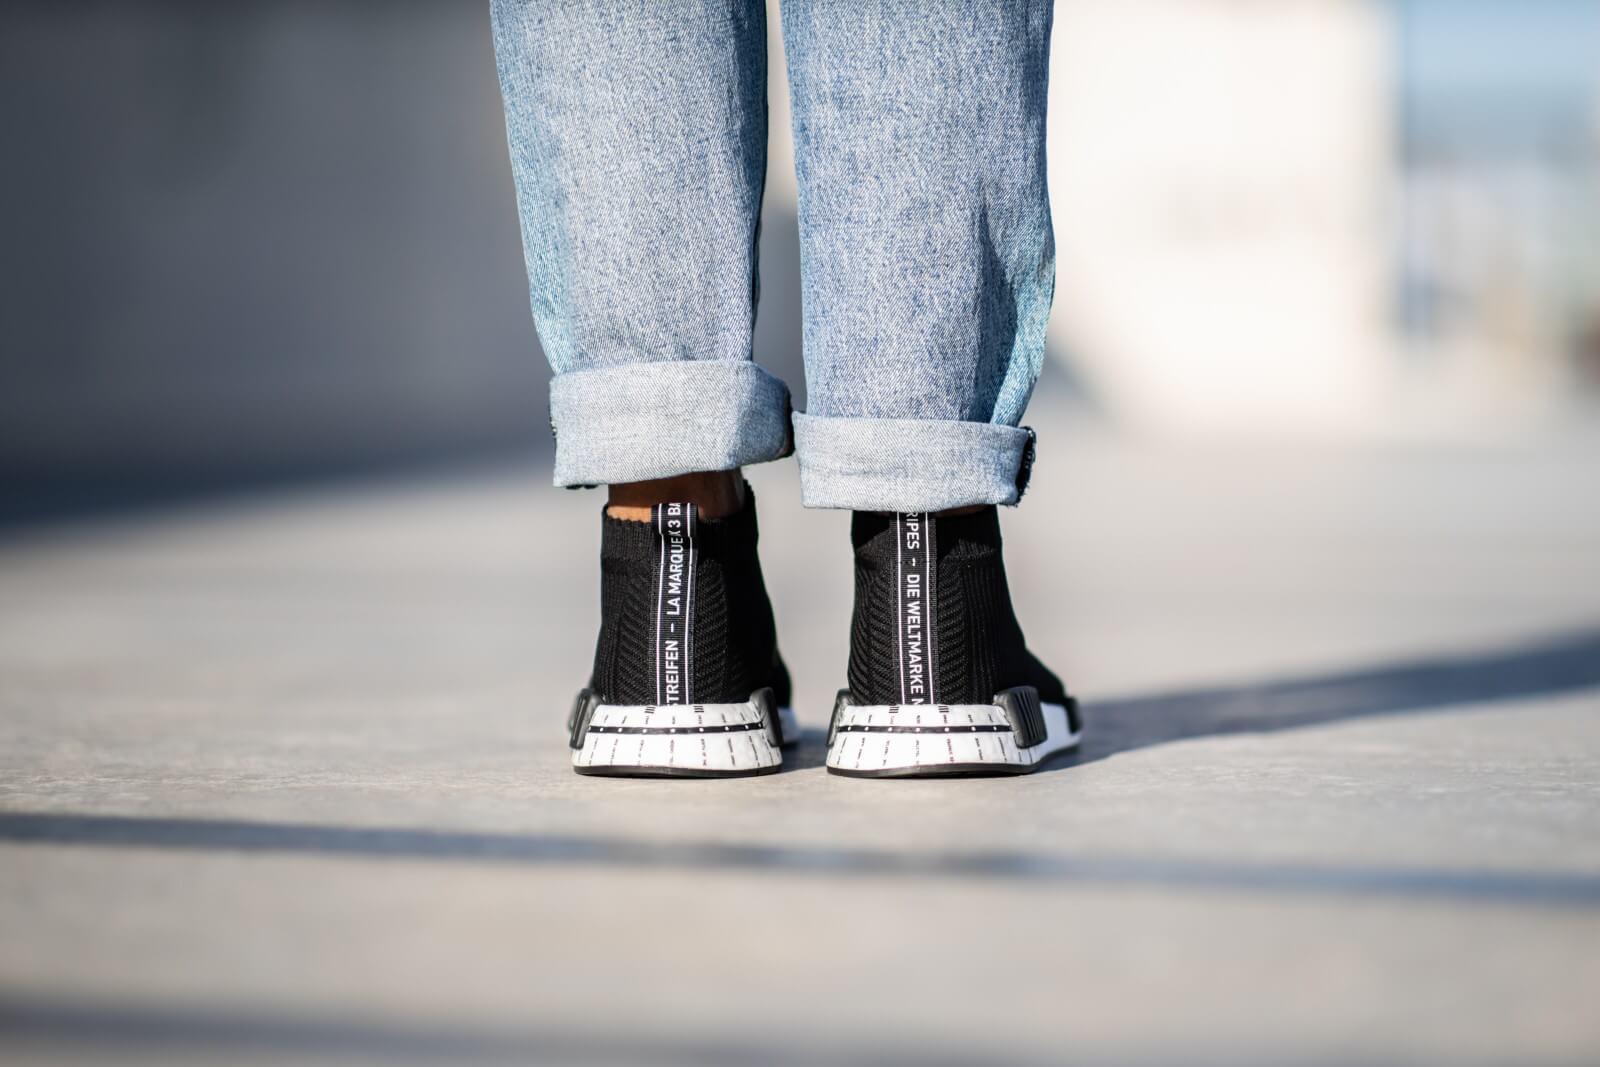 Adidas NMD City Sock 1 Primeknit Black